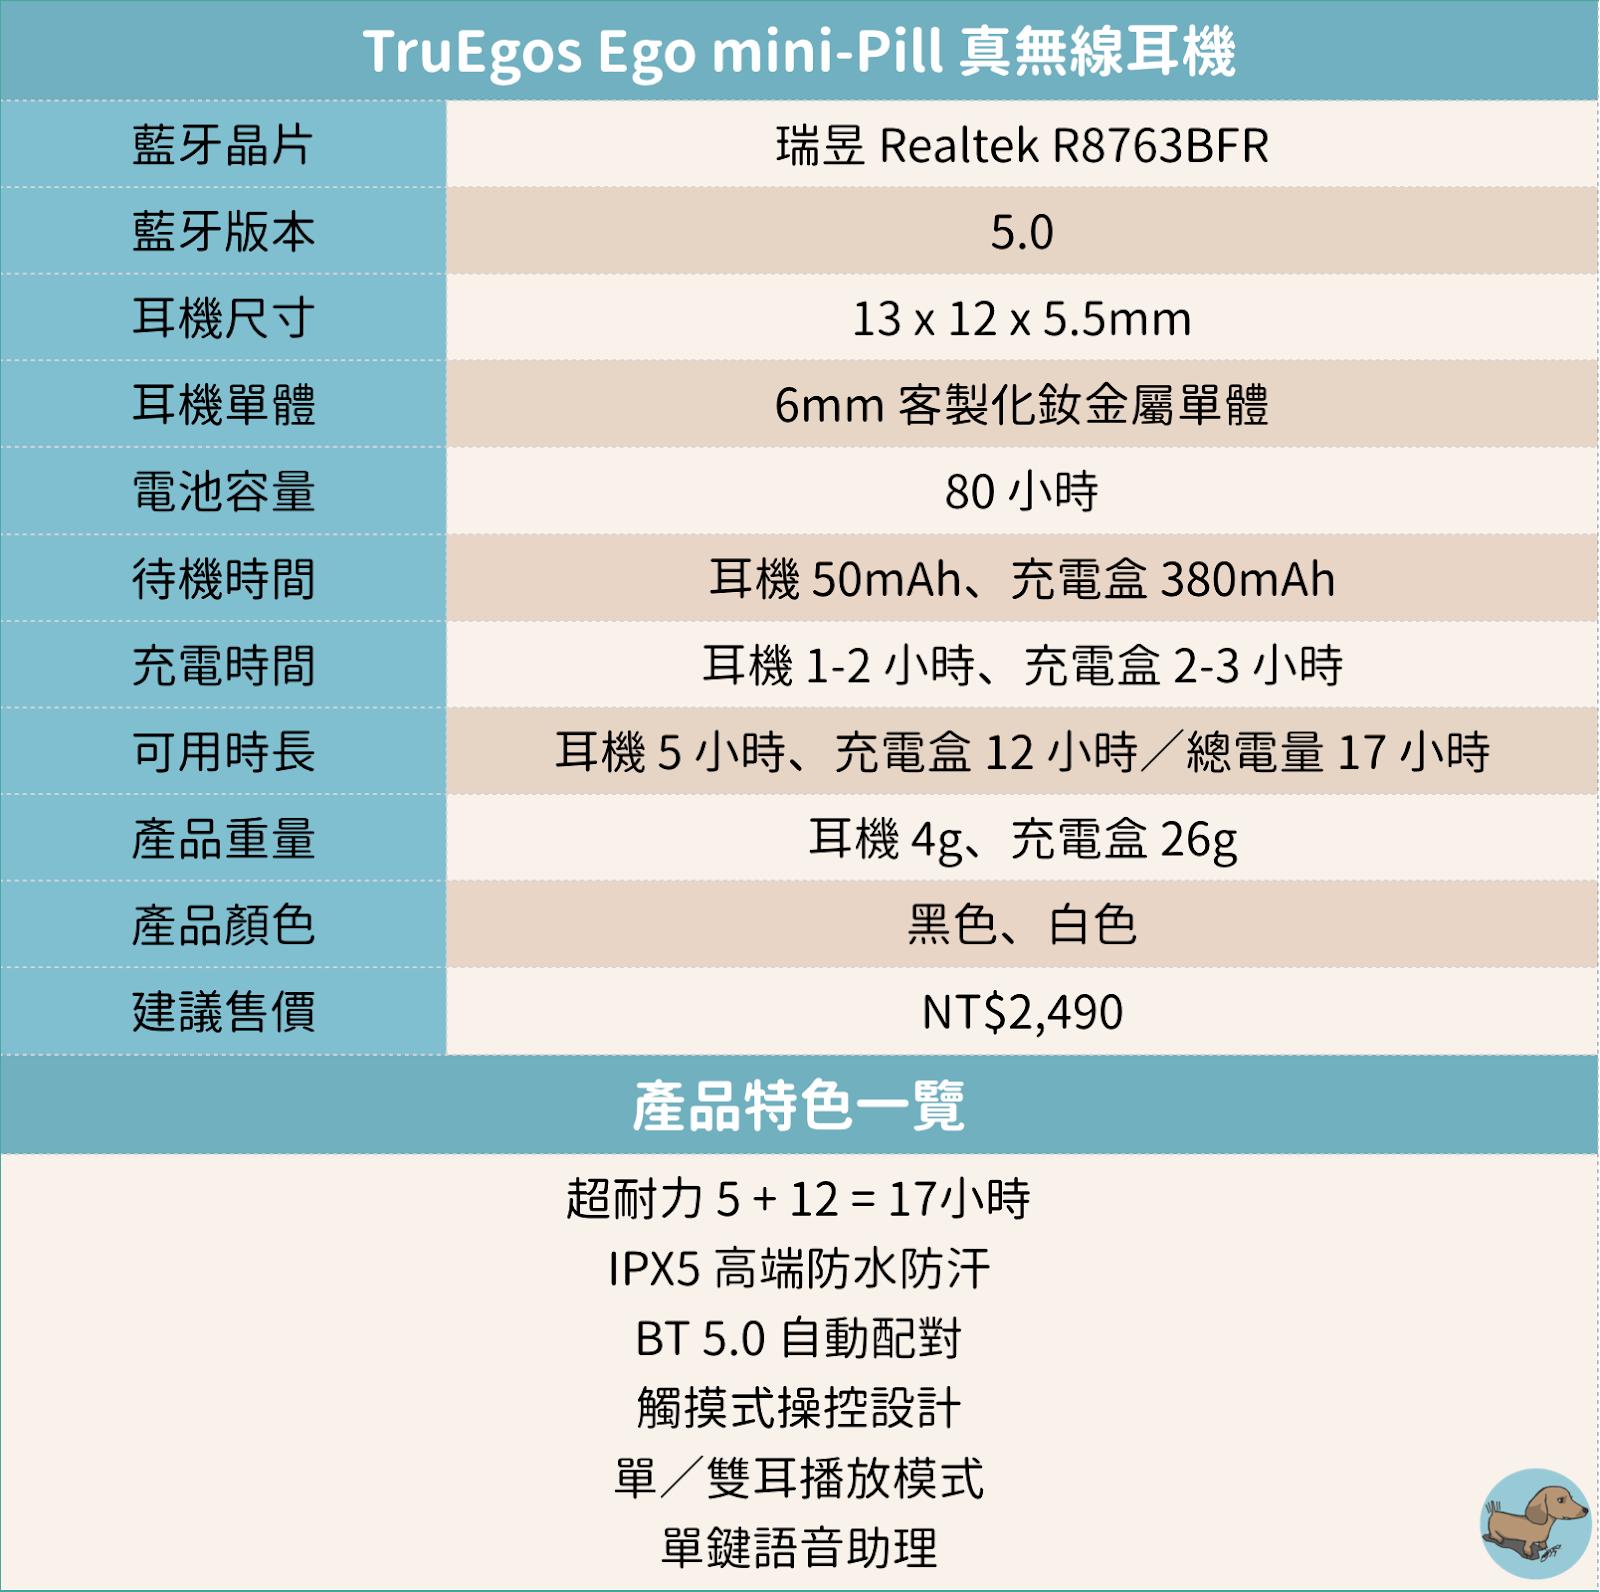 TruEgos Ego mini-Pill 平價真無線藍牙耳機開箱評測 17 hrs 耐久力、26g 超輕巧、IPX5 防水防汗